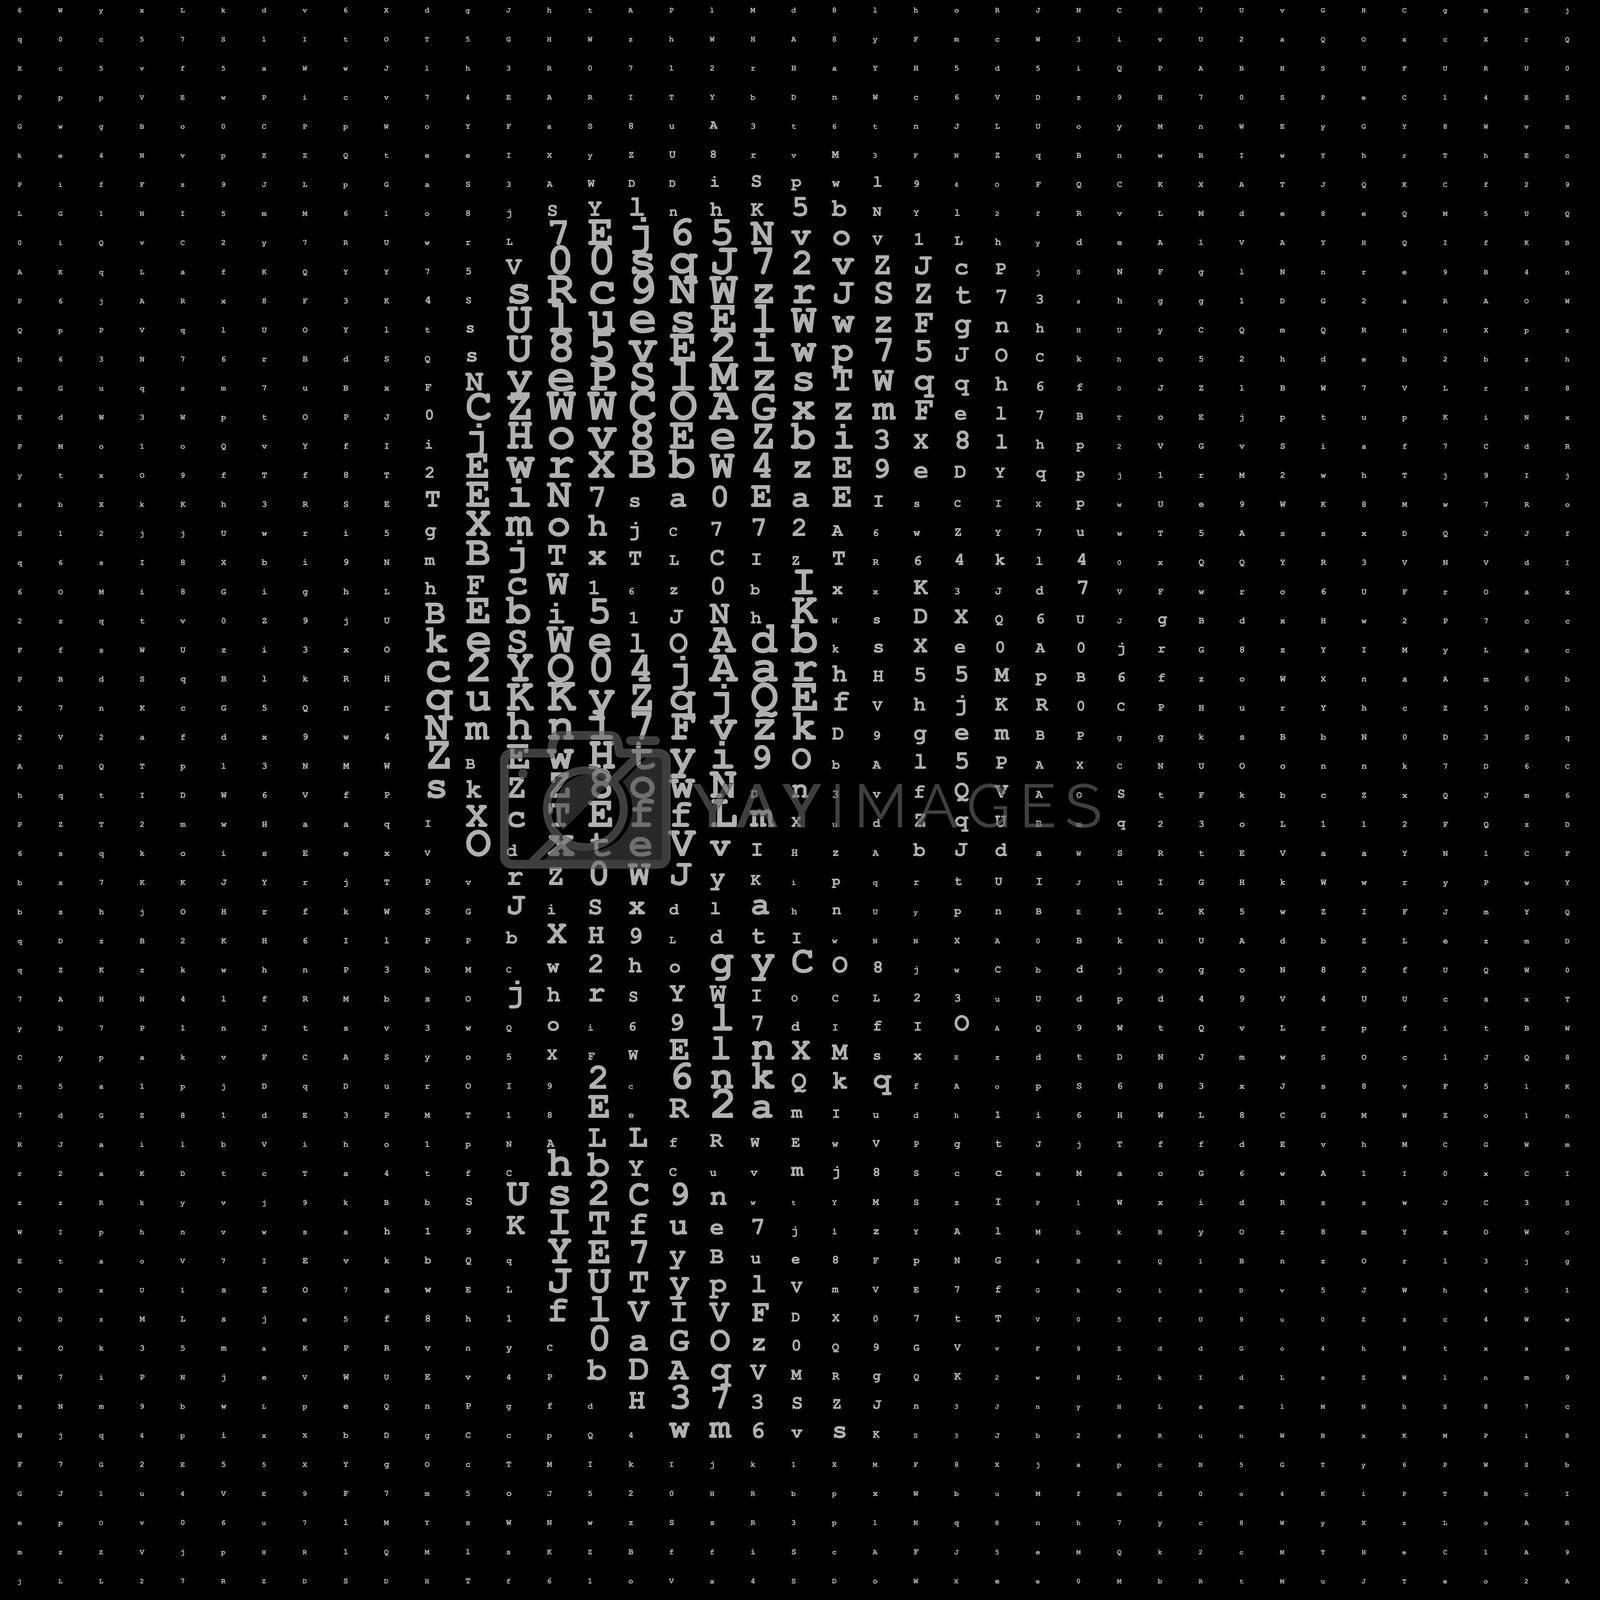 Man portrait, matrix illustration, artificial intelligence or cyber security concept